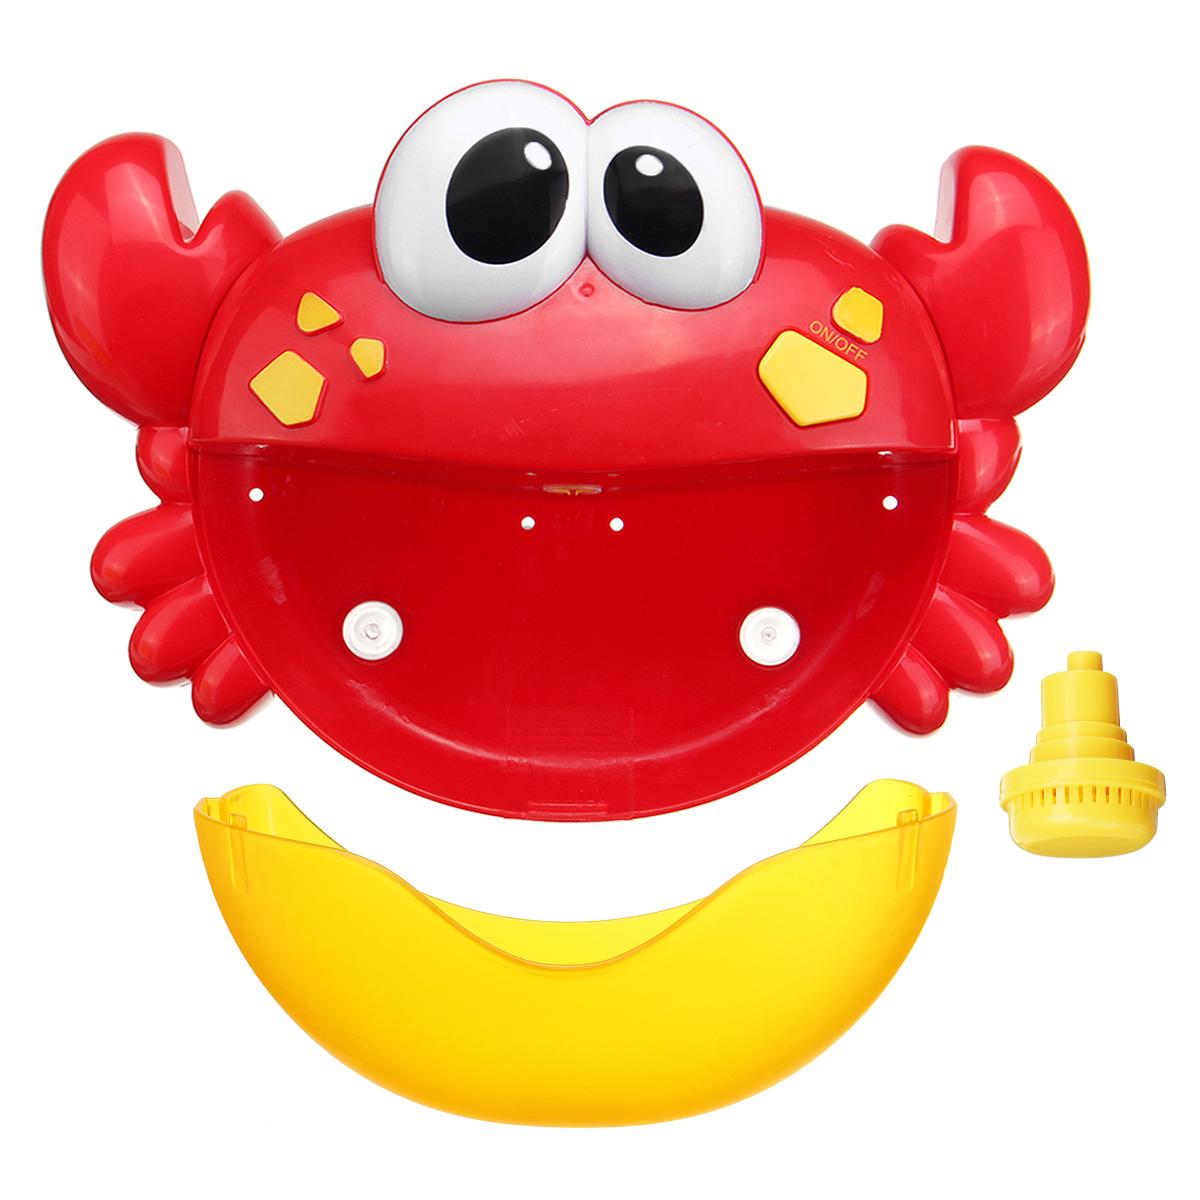 Adorable Crab Bubble Machine Music Bubble Maker Bath Baby Bath Shower Fun Red Plastic Toys